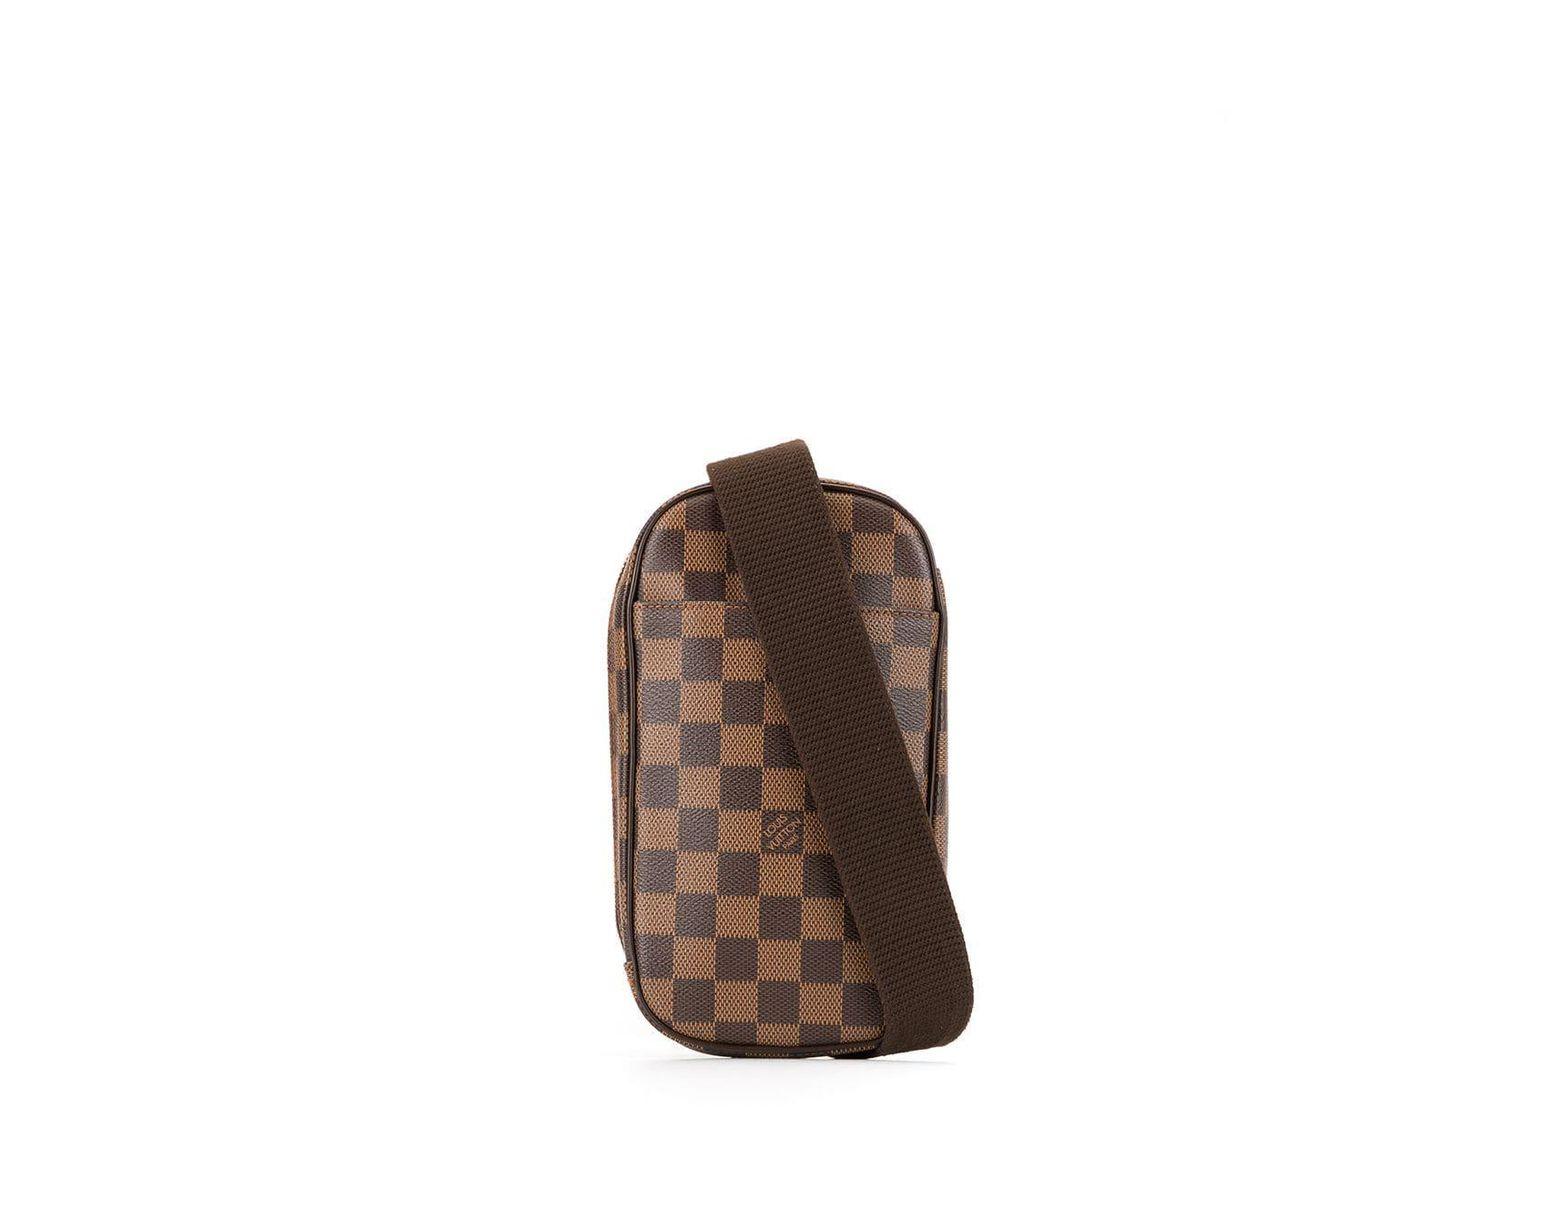 a4d3d452 Louis Vuitton Pre-Owned Gange Belt Bag in Brown - Lyst